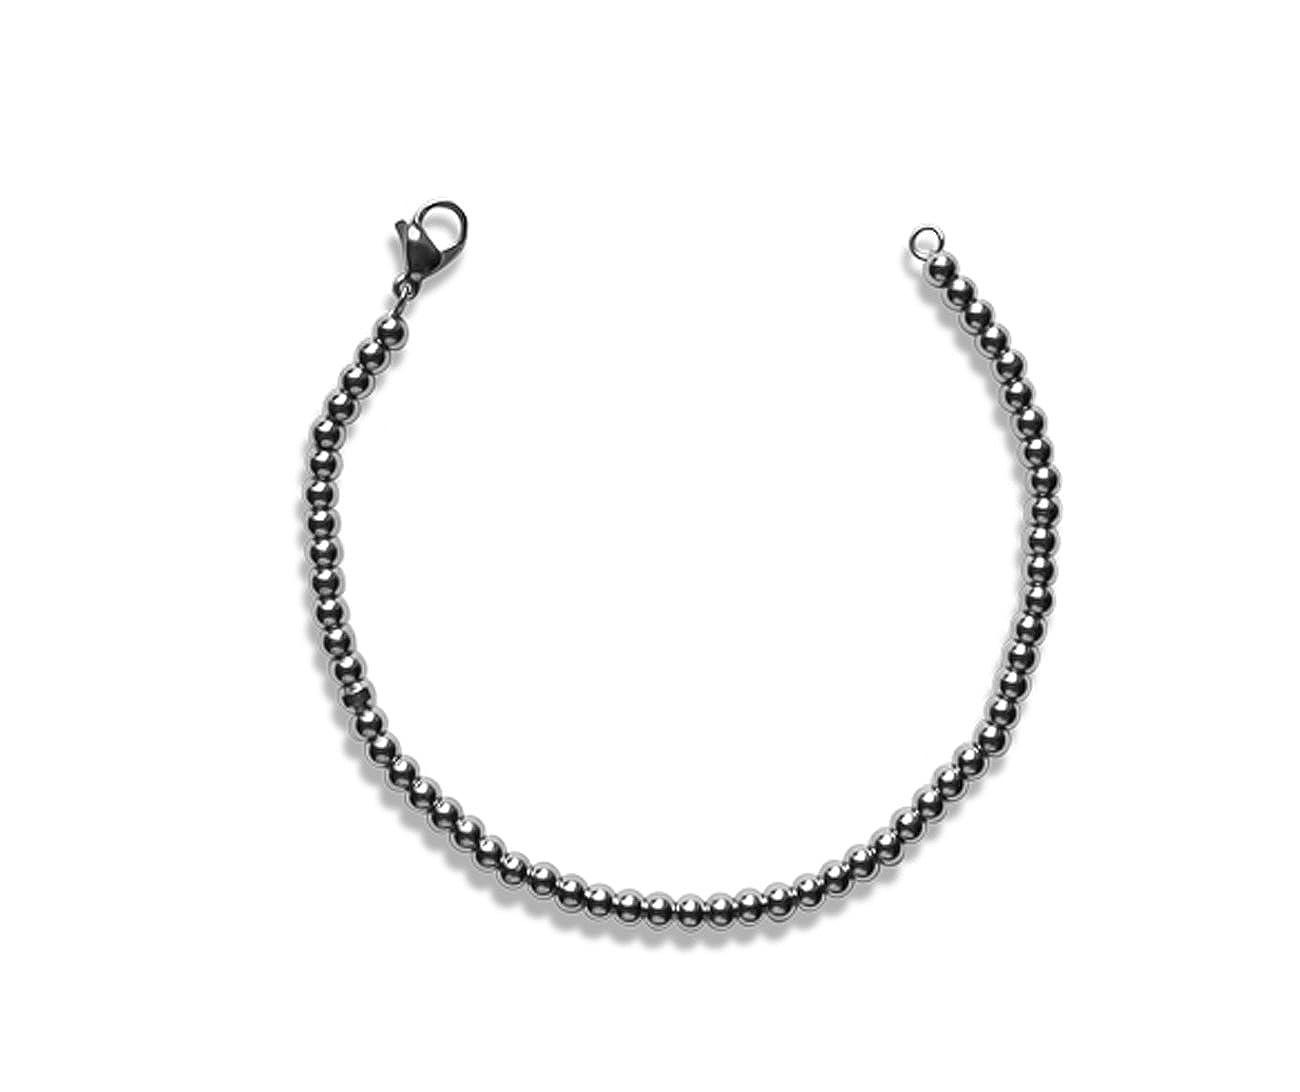 Bahnmüller Edelstahl-Armband Armkette Silber Länge 19cm B:3,0mm 960